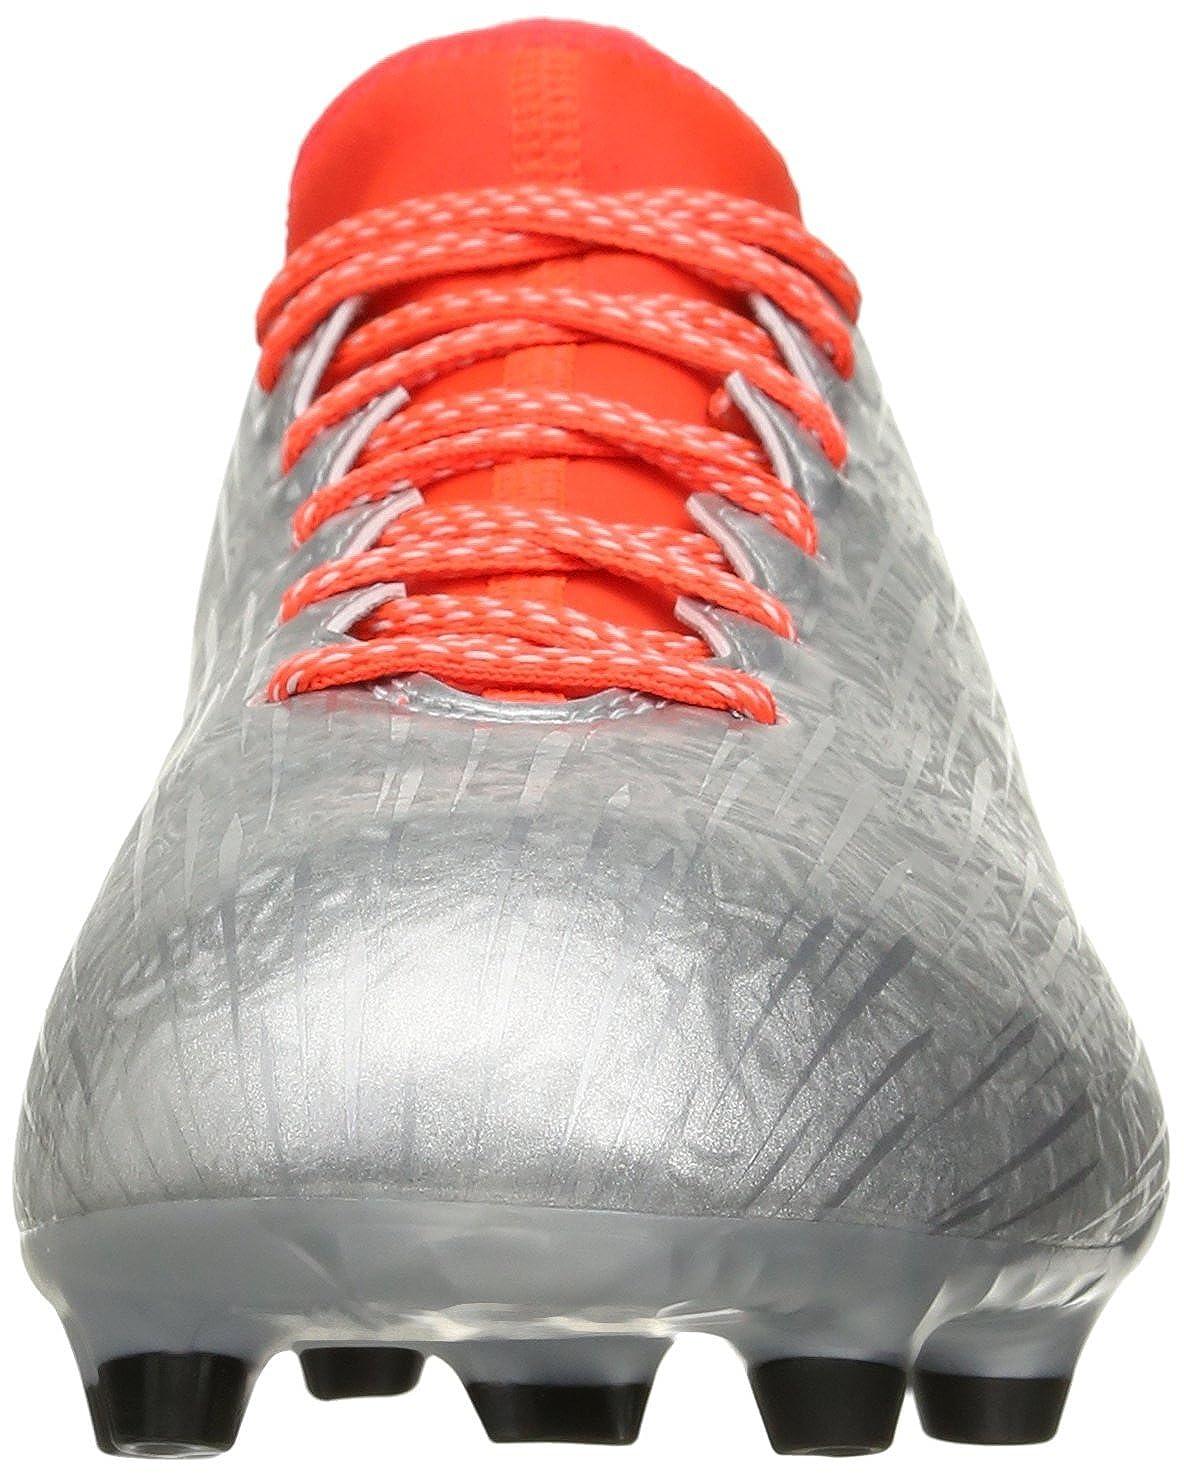 Adidas Adidas Adidas , Herren Fußballschuhe Silber Silber Metallic schwarz Infrarot f66b3d